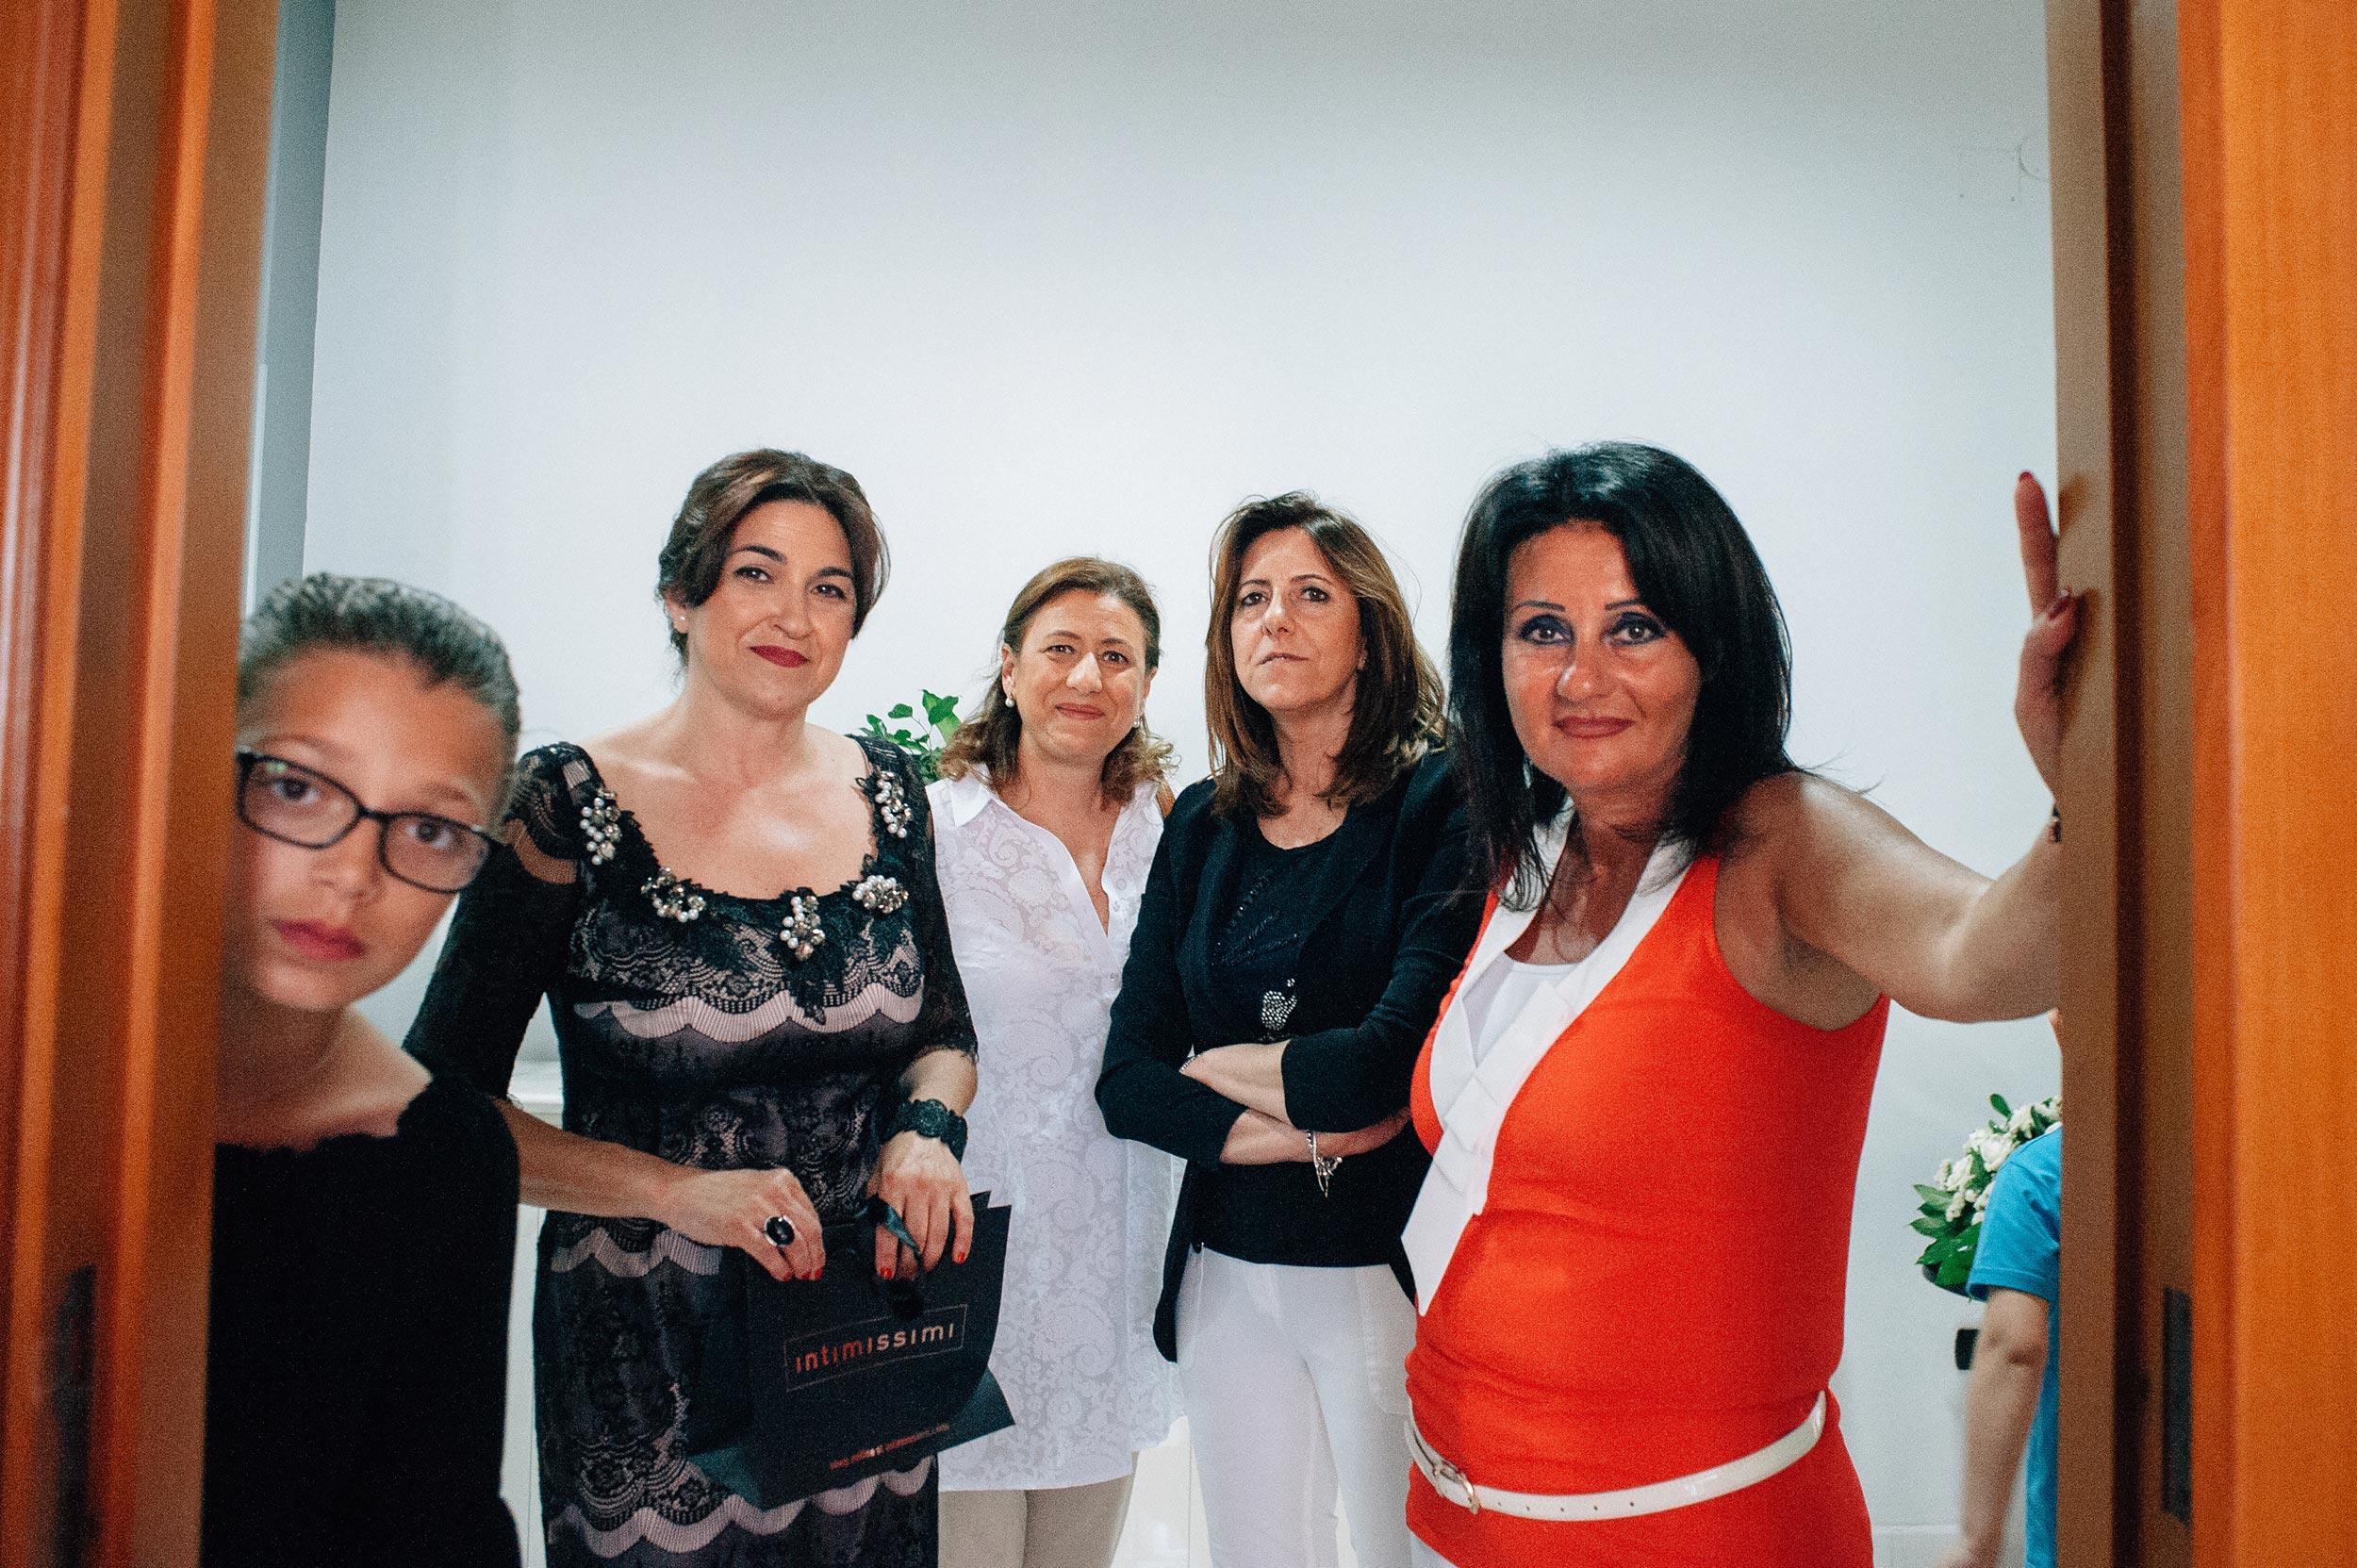 2016-Claudio-Teresa-Naples-Wedding-Photographer-Italy-Alessandro-Avenali-29.jpg